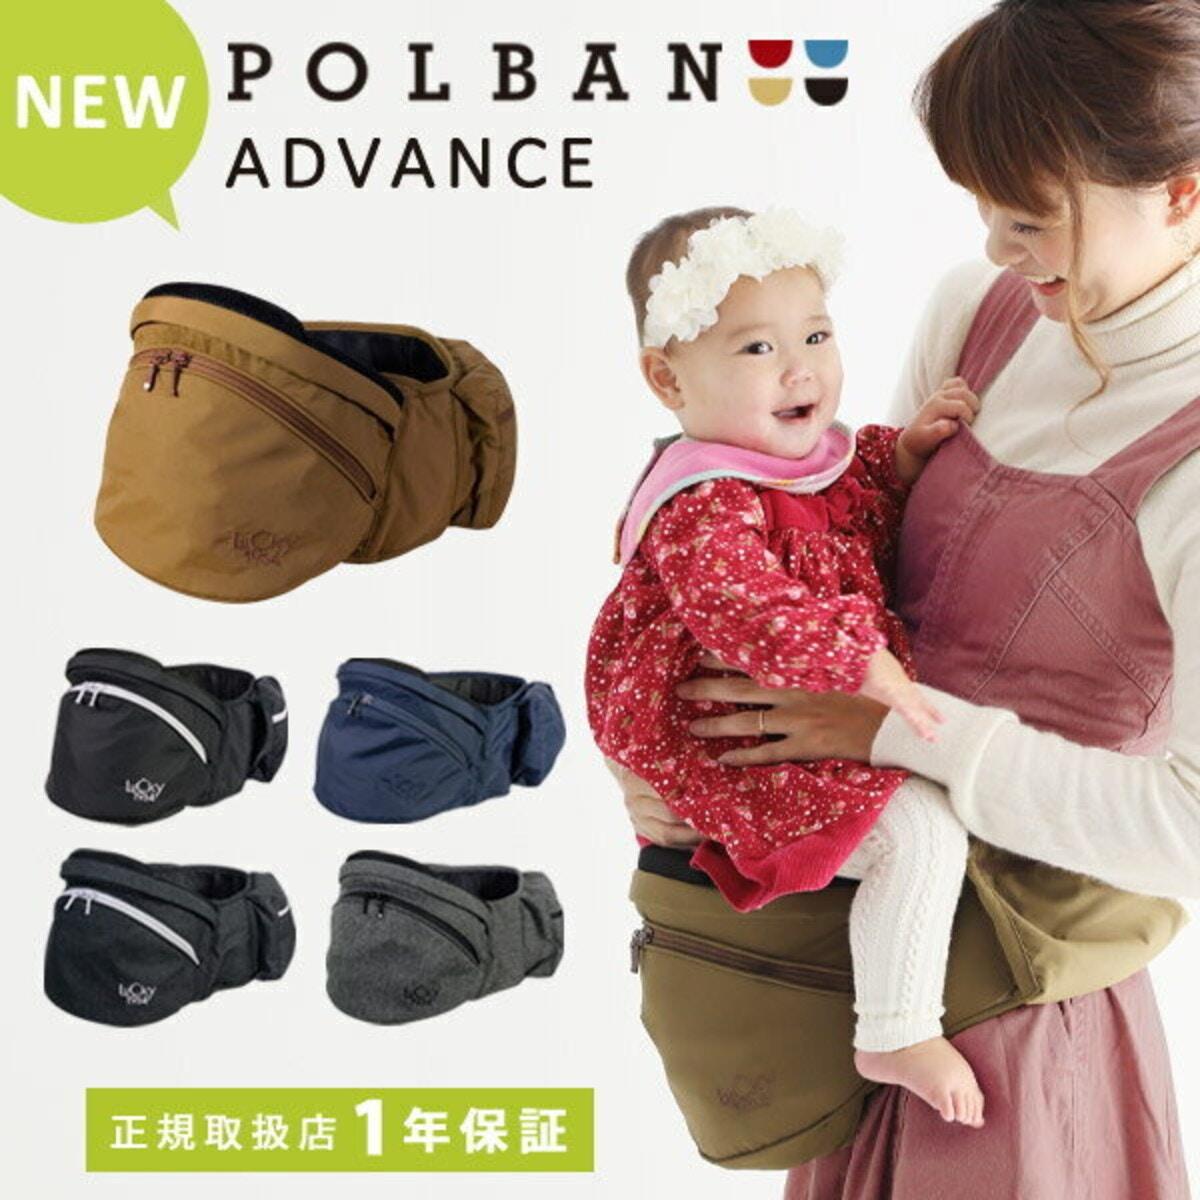 POLBAN ADVANCE (ポルバン アドバンス)「ヒップシート」